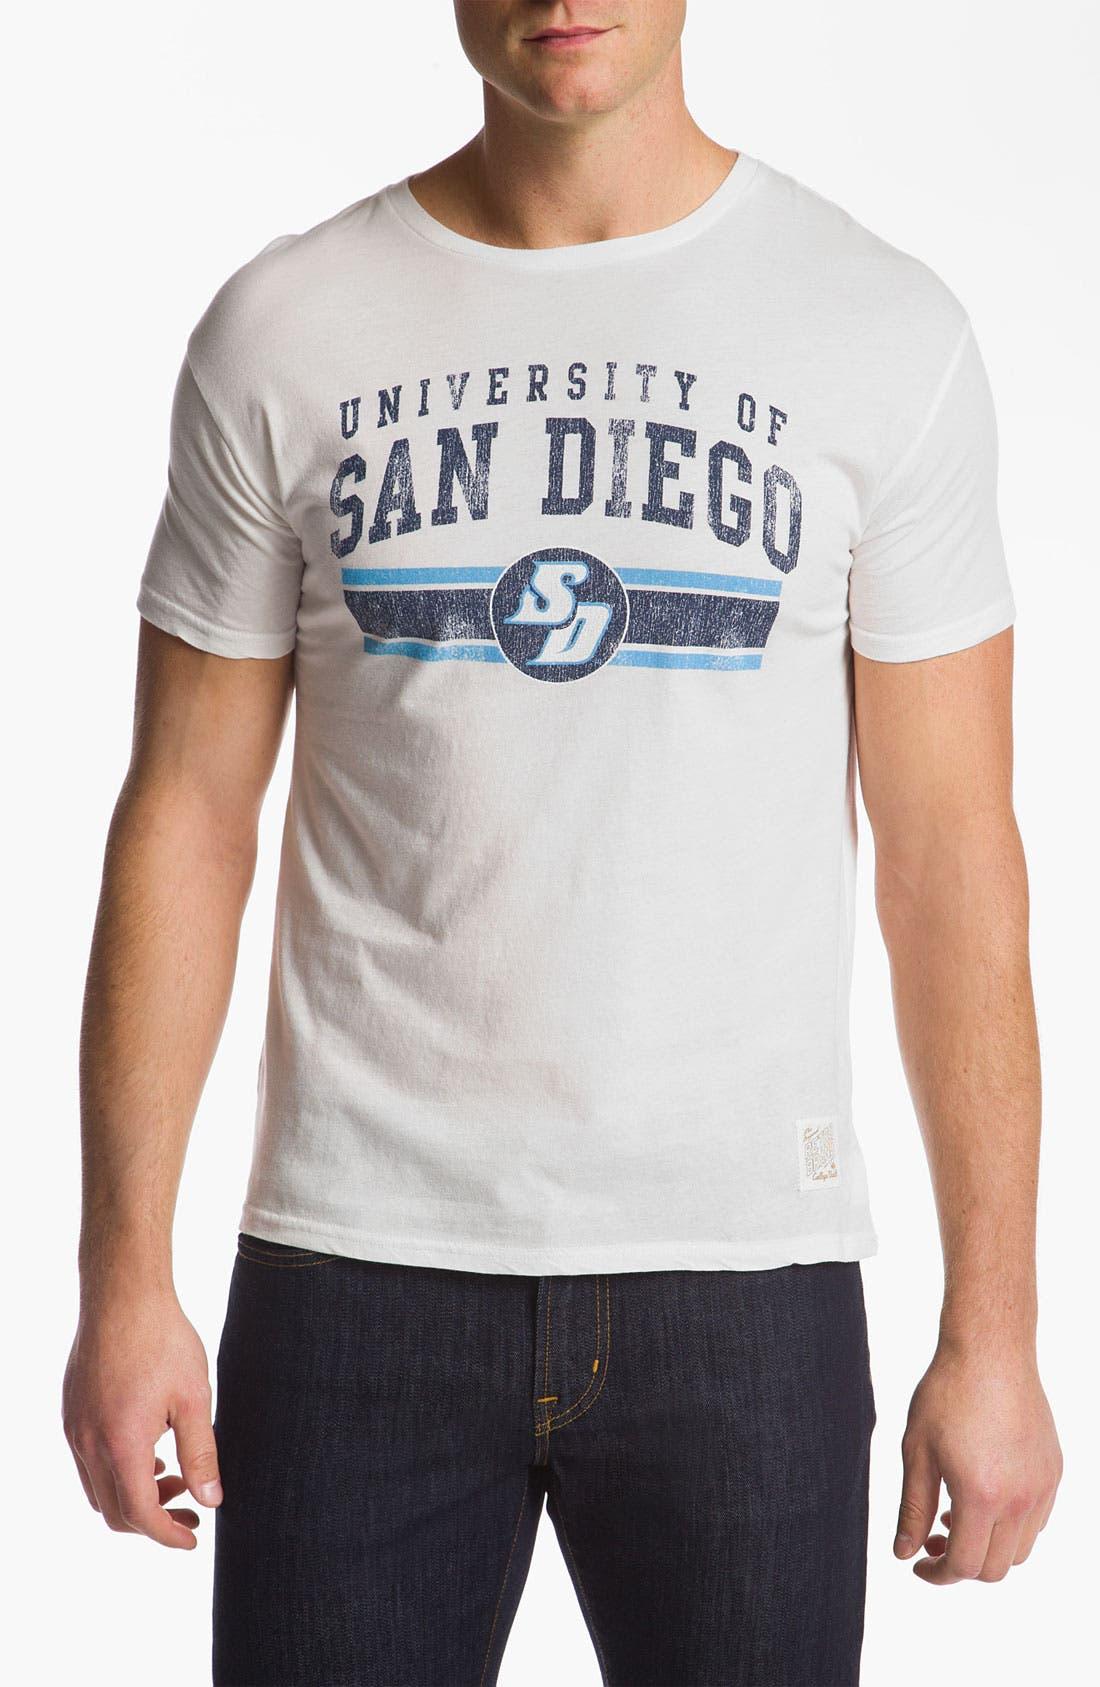 Alternate Image 1 Selected - The Original Retro Brand 'University of San Diego' T-Shirt